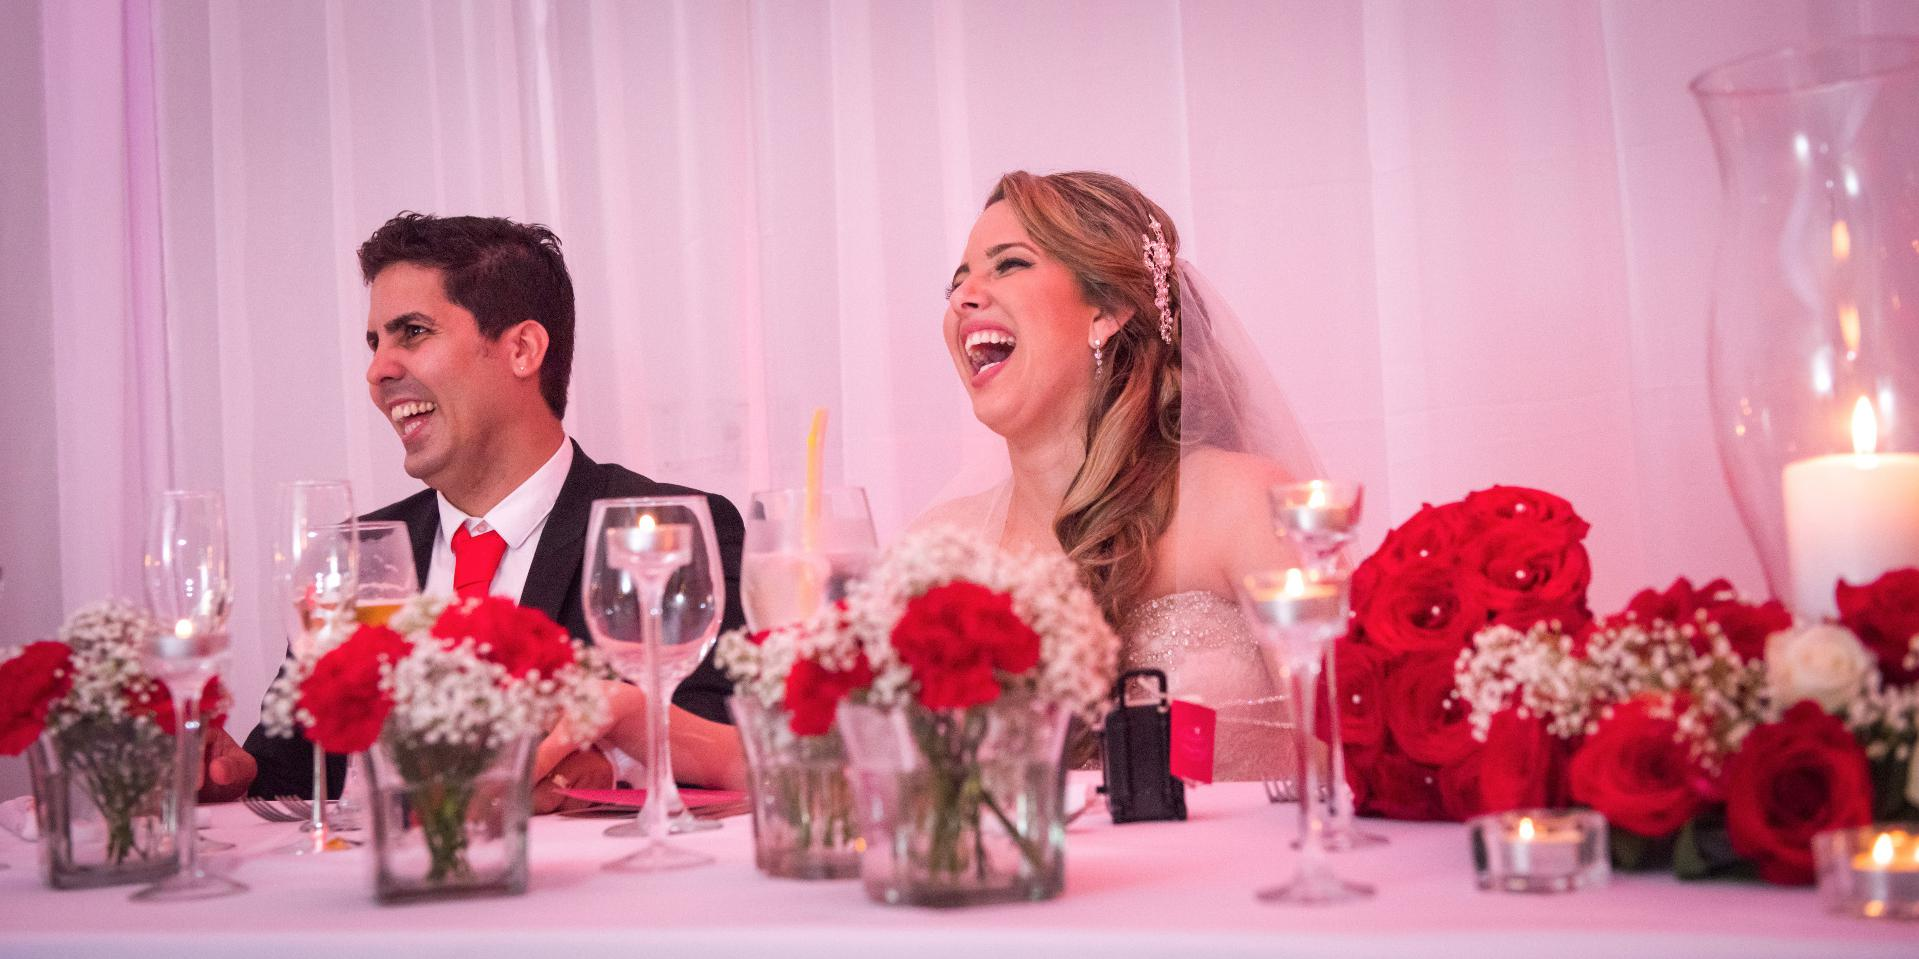 bodas-sin-clasificar-sin-tema-cuba-29531.jpg